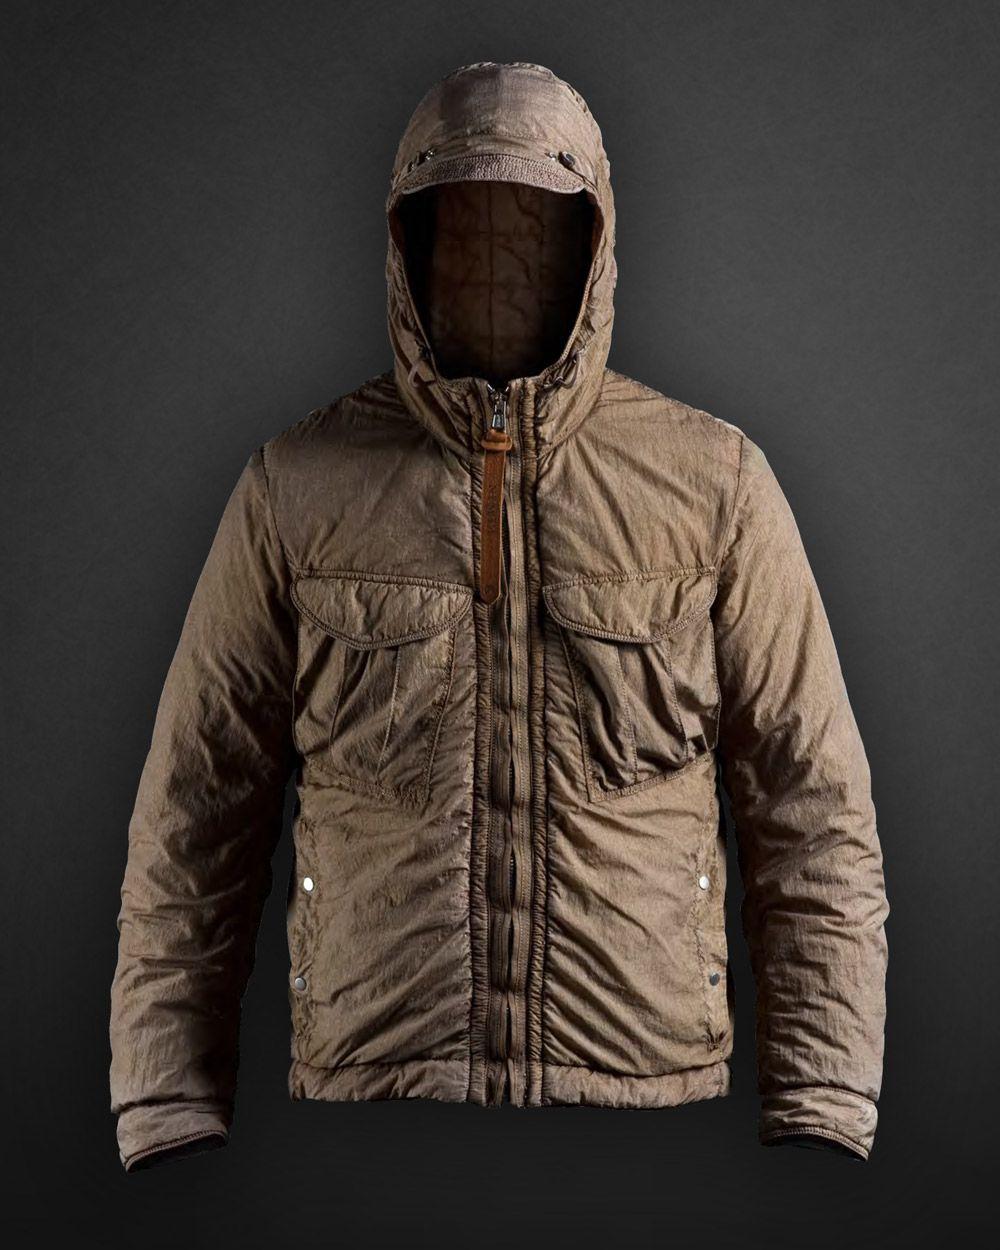 NEMEN NMN_I14016 HOODED OVERSHIRT JACKET Jackets, Winter